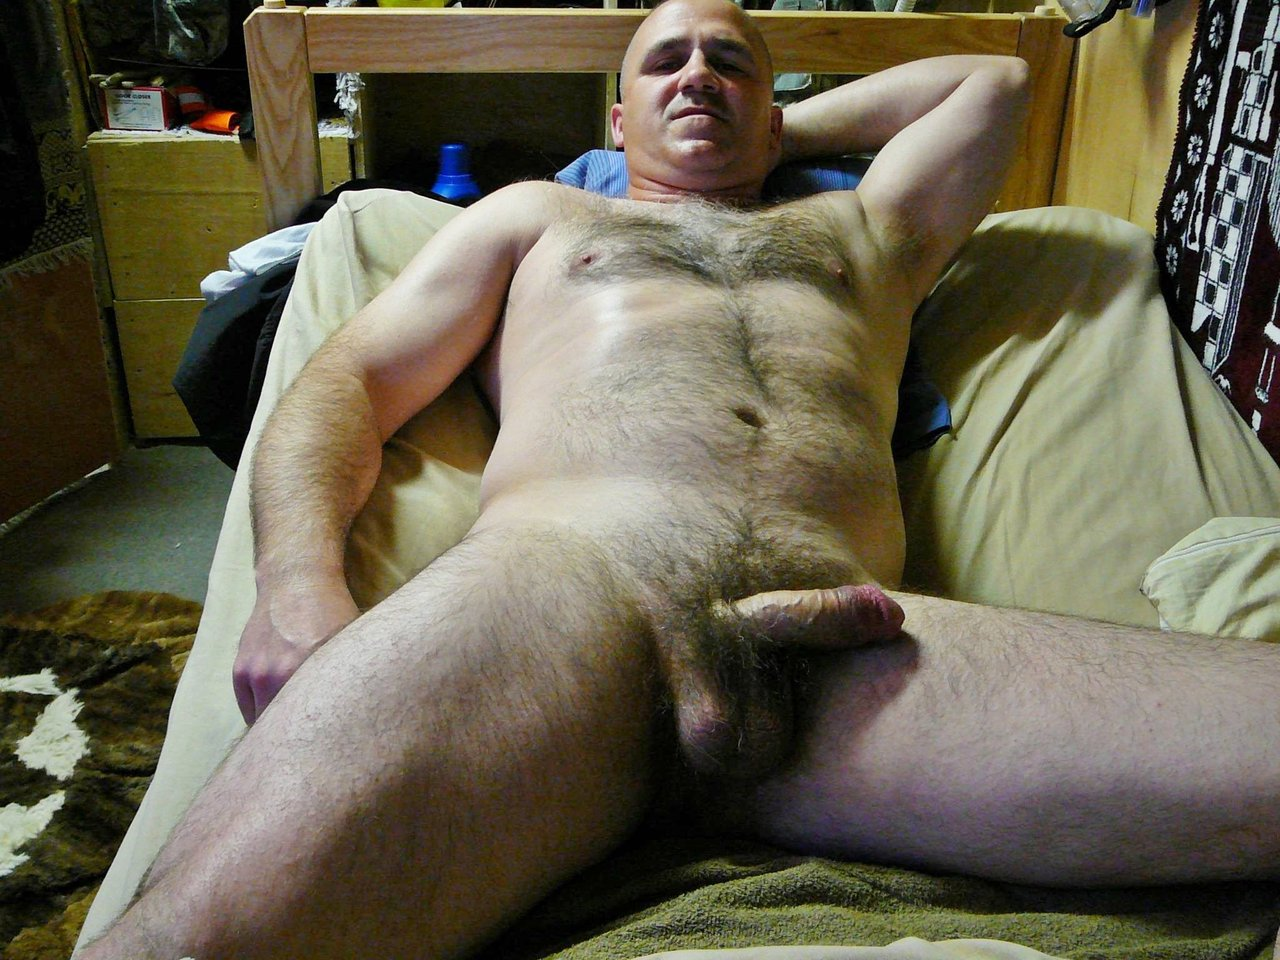 Of Call Them Hot Mature Dads Daddieslicious Silver Daddies Old Gay Men